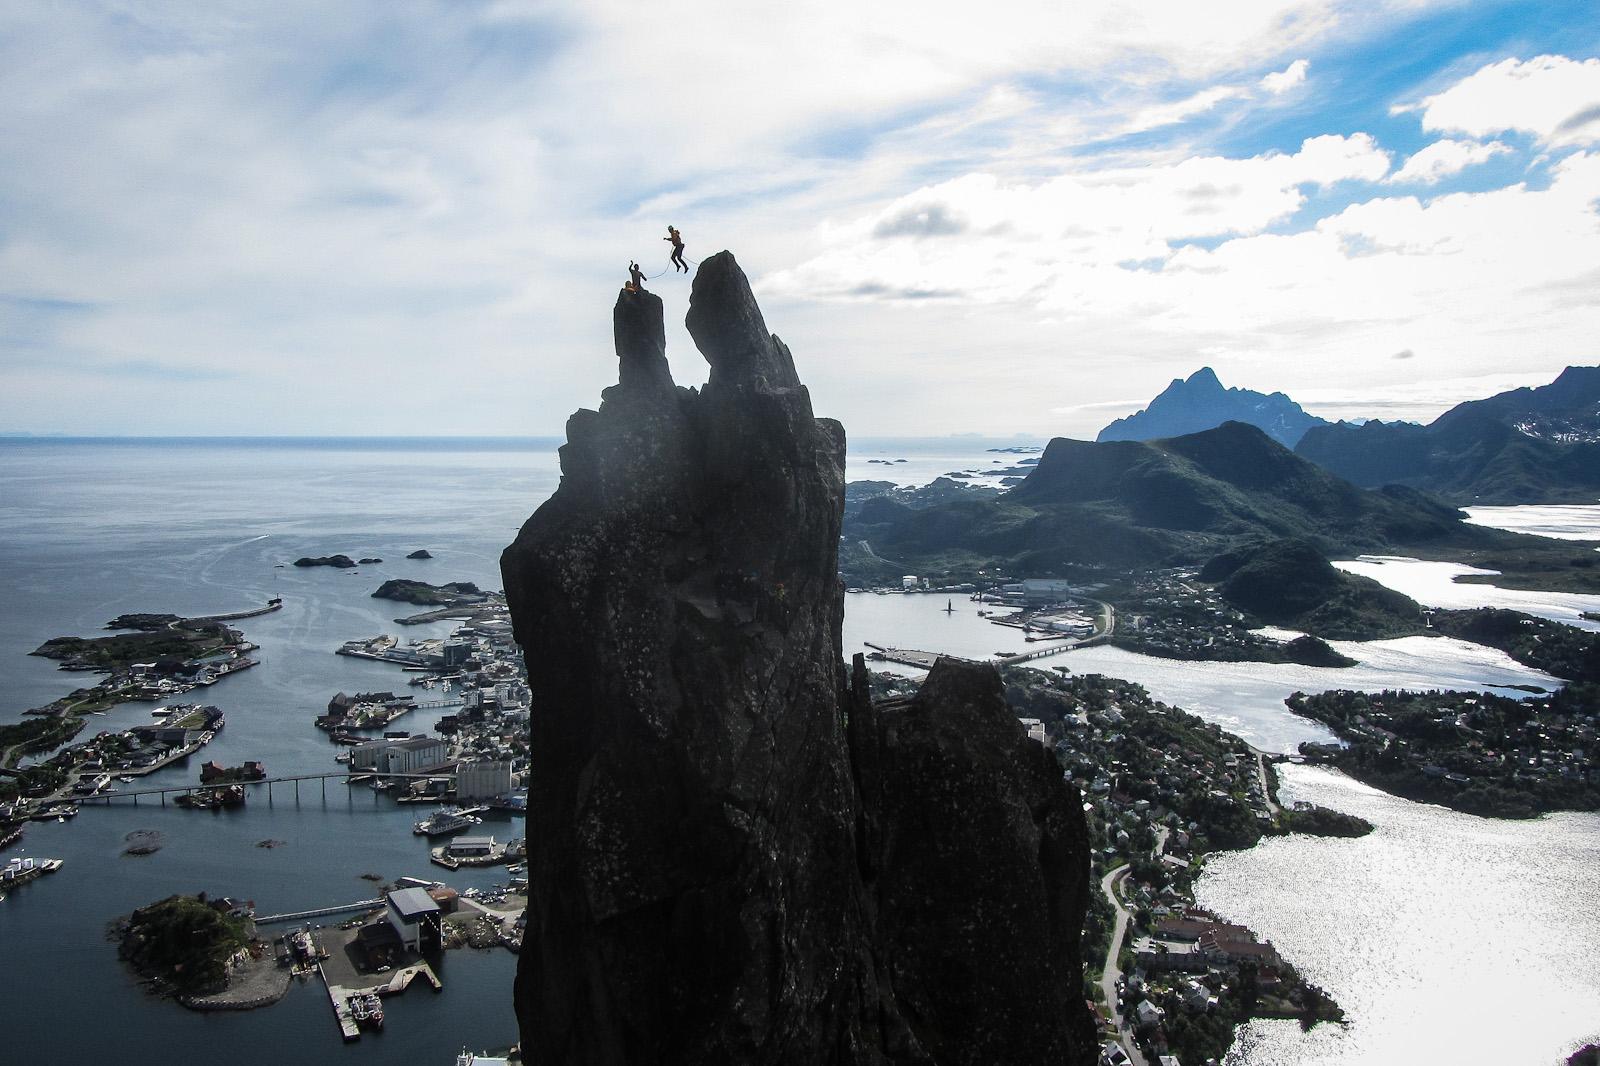 Svolvaergeita, norway, grind, Travel, Northern Alpine Guides, Jump, climb, Cliffs, Jumping the horns, Norwegian Trekking Association, photography, Norwegian, europe